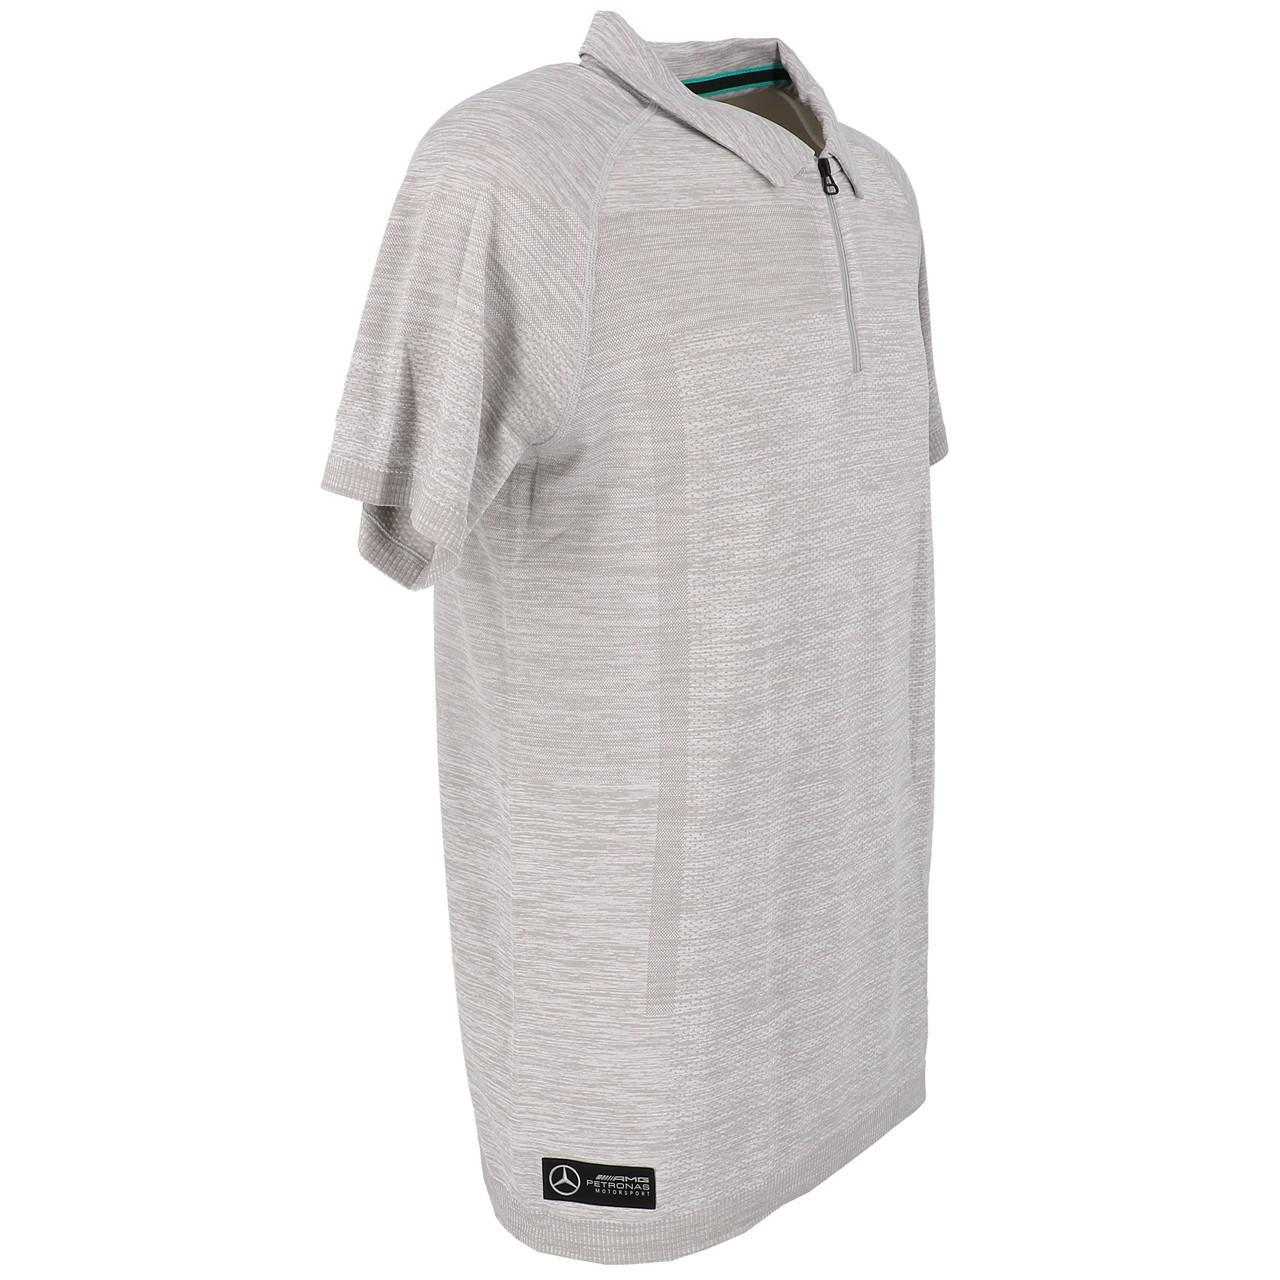 Short-Sleeve-Polo-Puma-Mapm-Rct-Evoknit-Groups-Polo-Grey-30141-New thumbnail 3